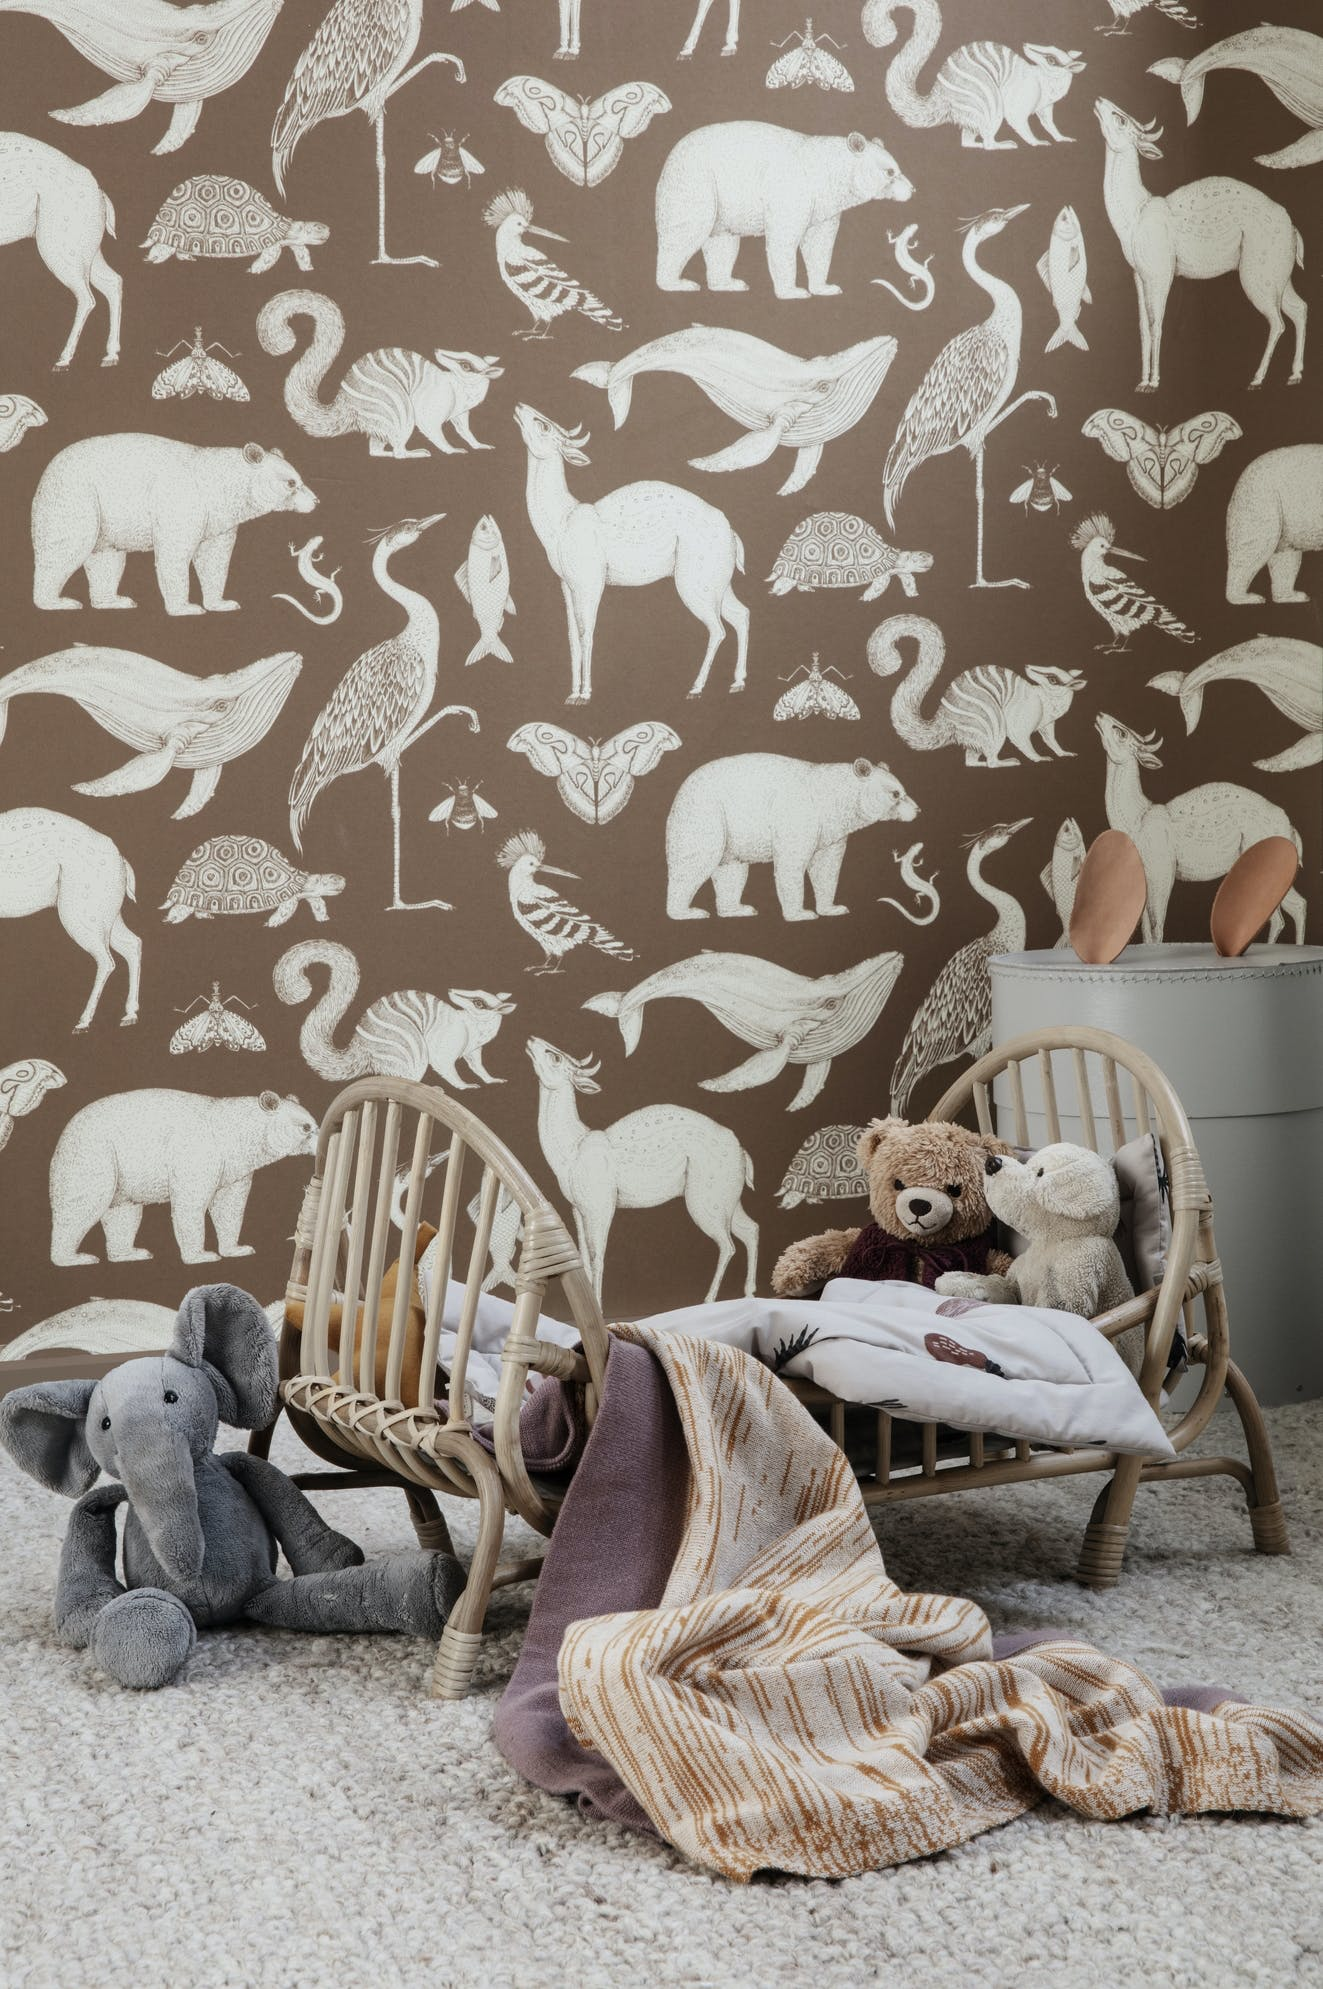 Ferm Living, Katie Scott Wallpaper - Animal